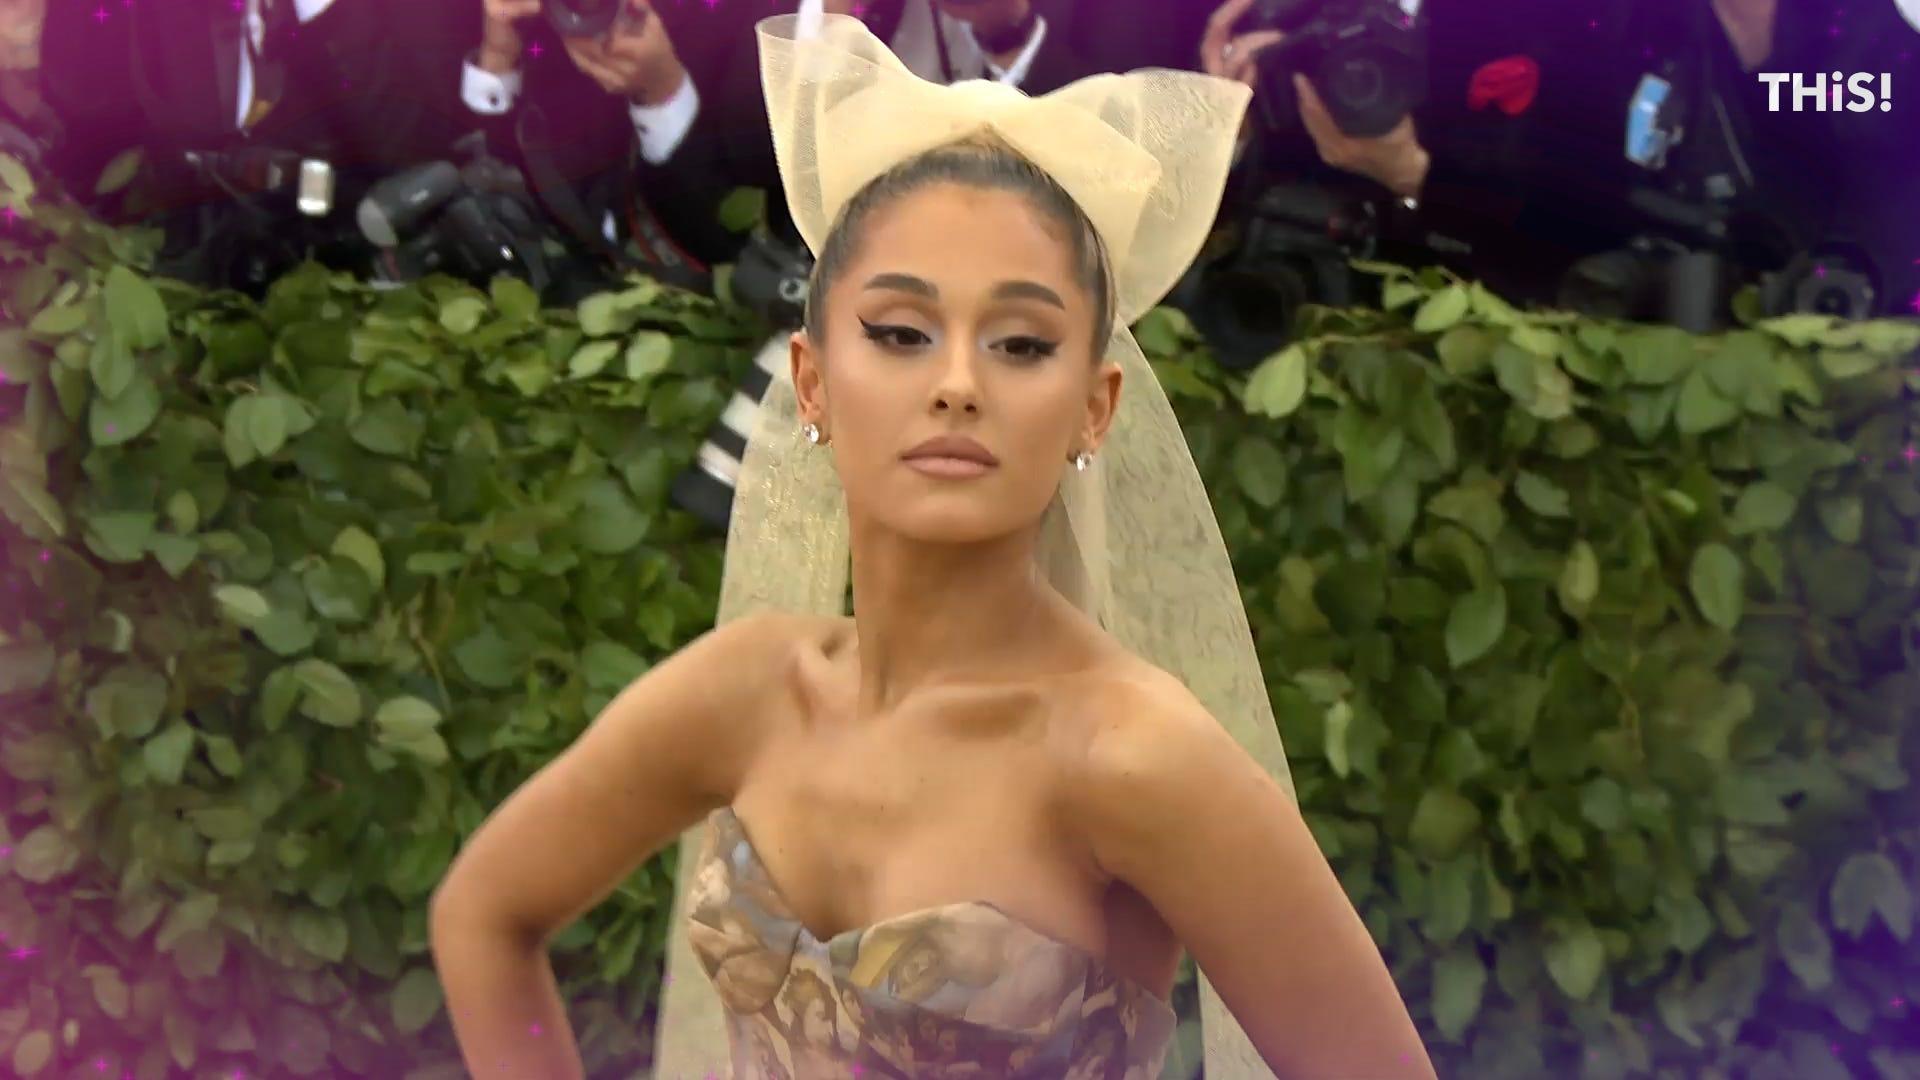 New Music Friday: Ariana Grande, Sam Smith, Busta Rhymes all drop new albums